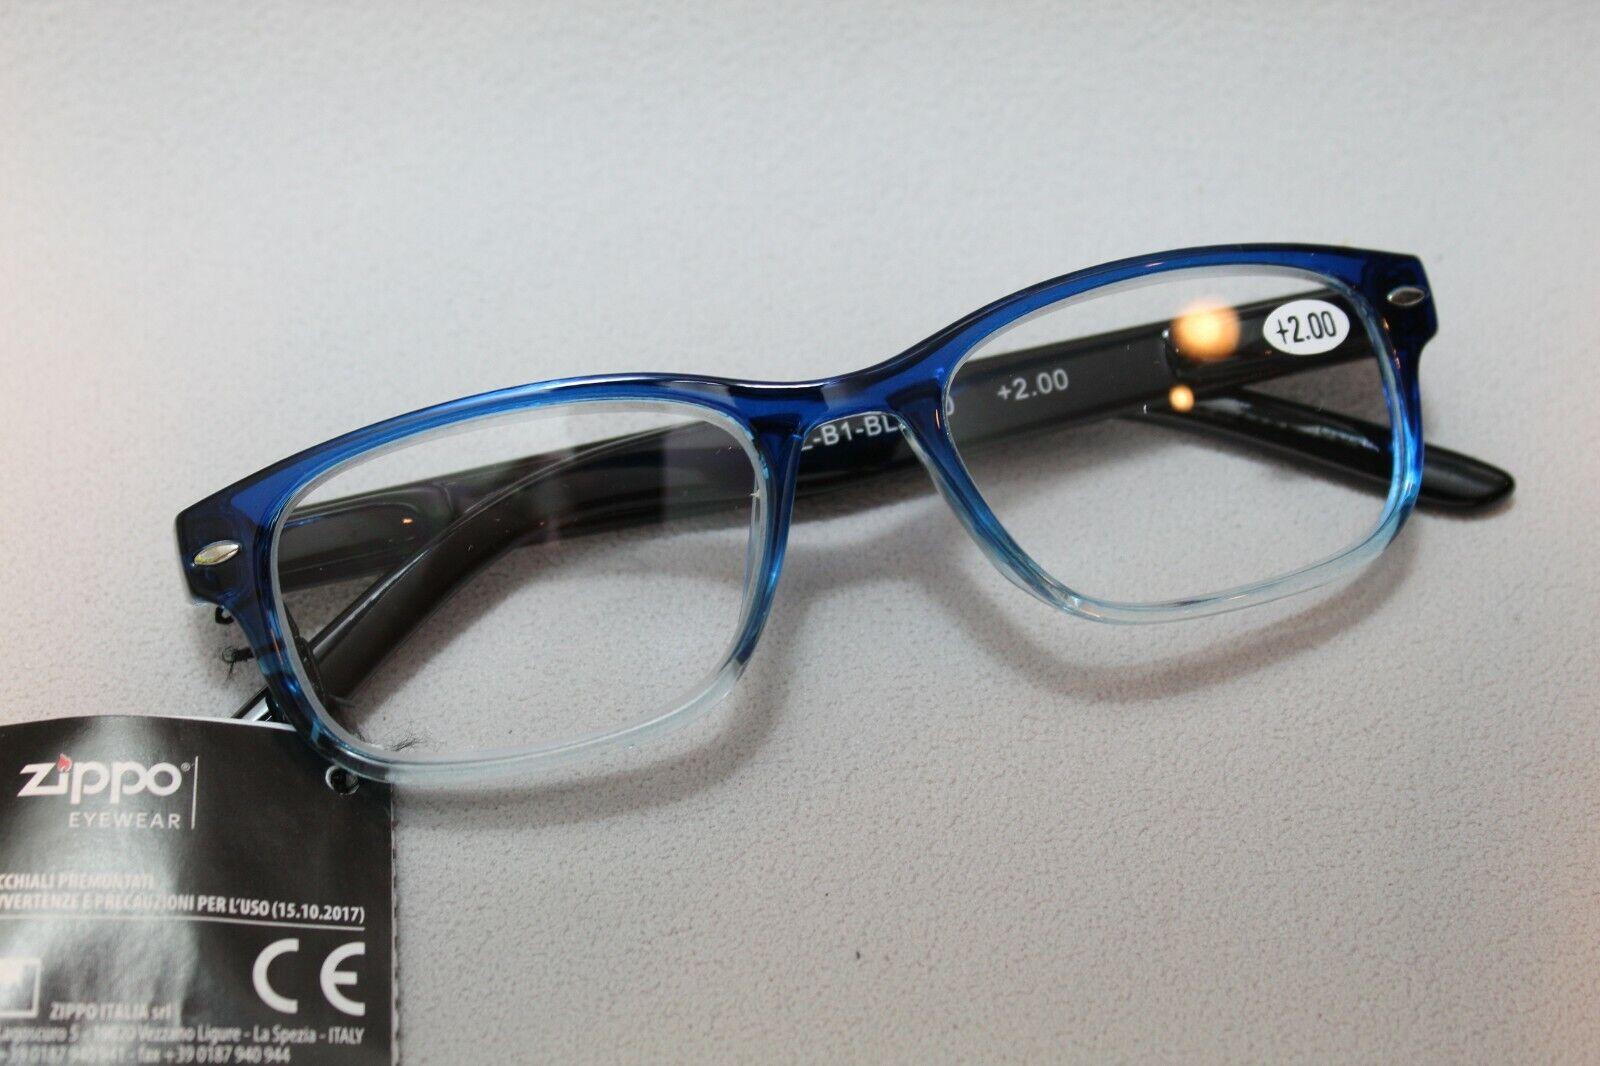 orig ZIPPO LESEHILFE LESEBRILLE - 2.00 - Retro blue - NEU - 706373